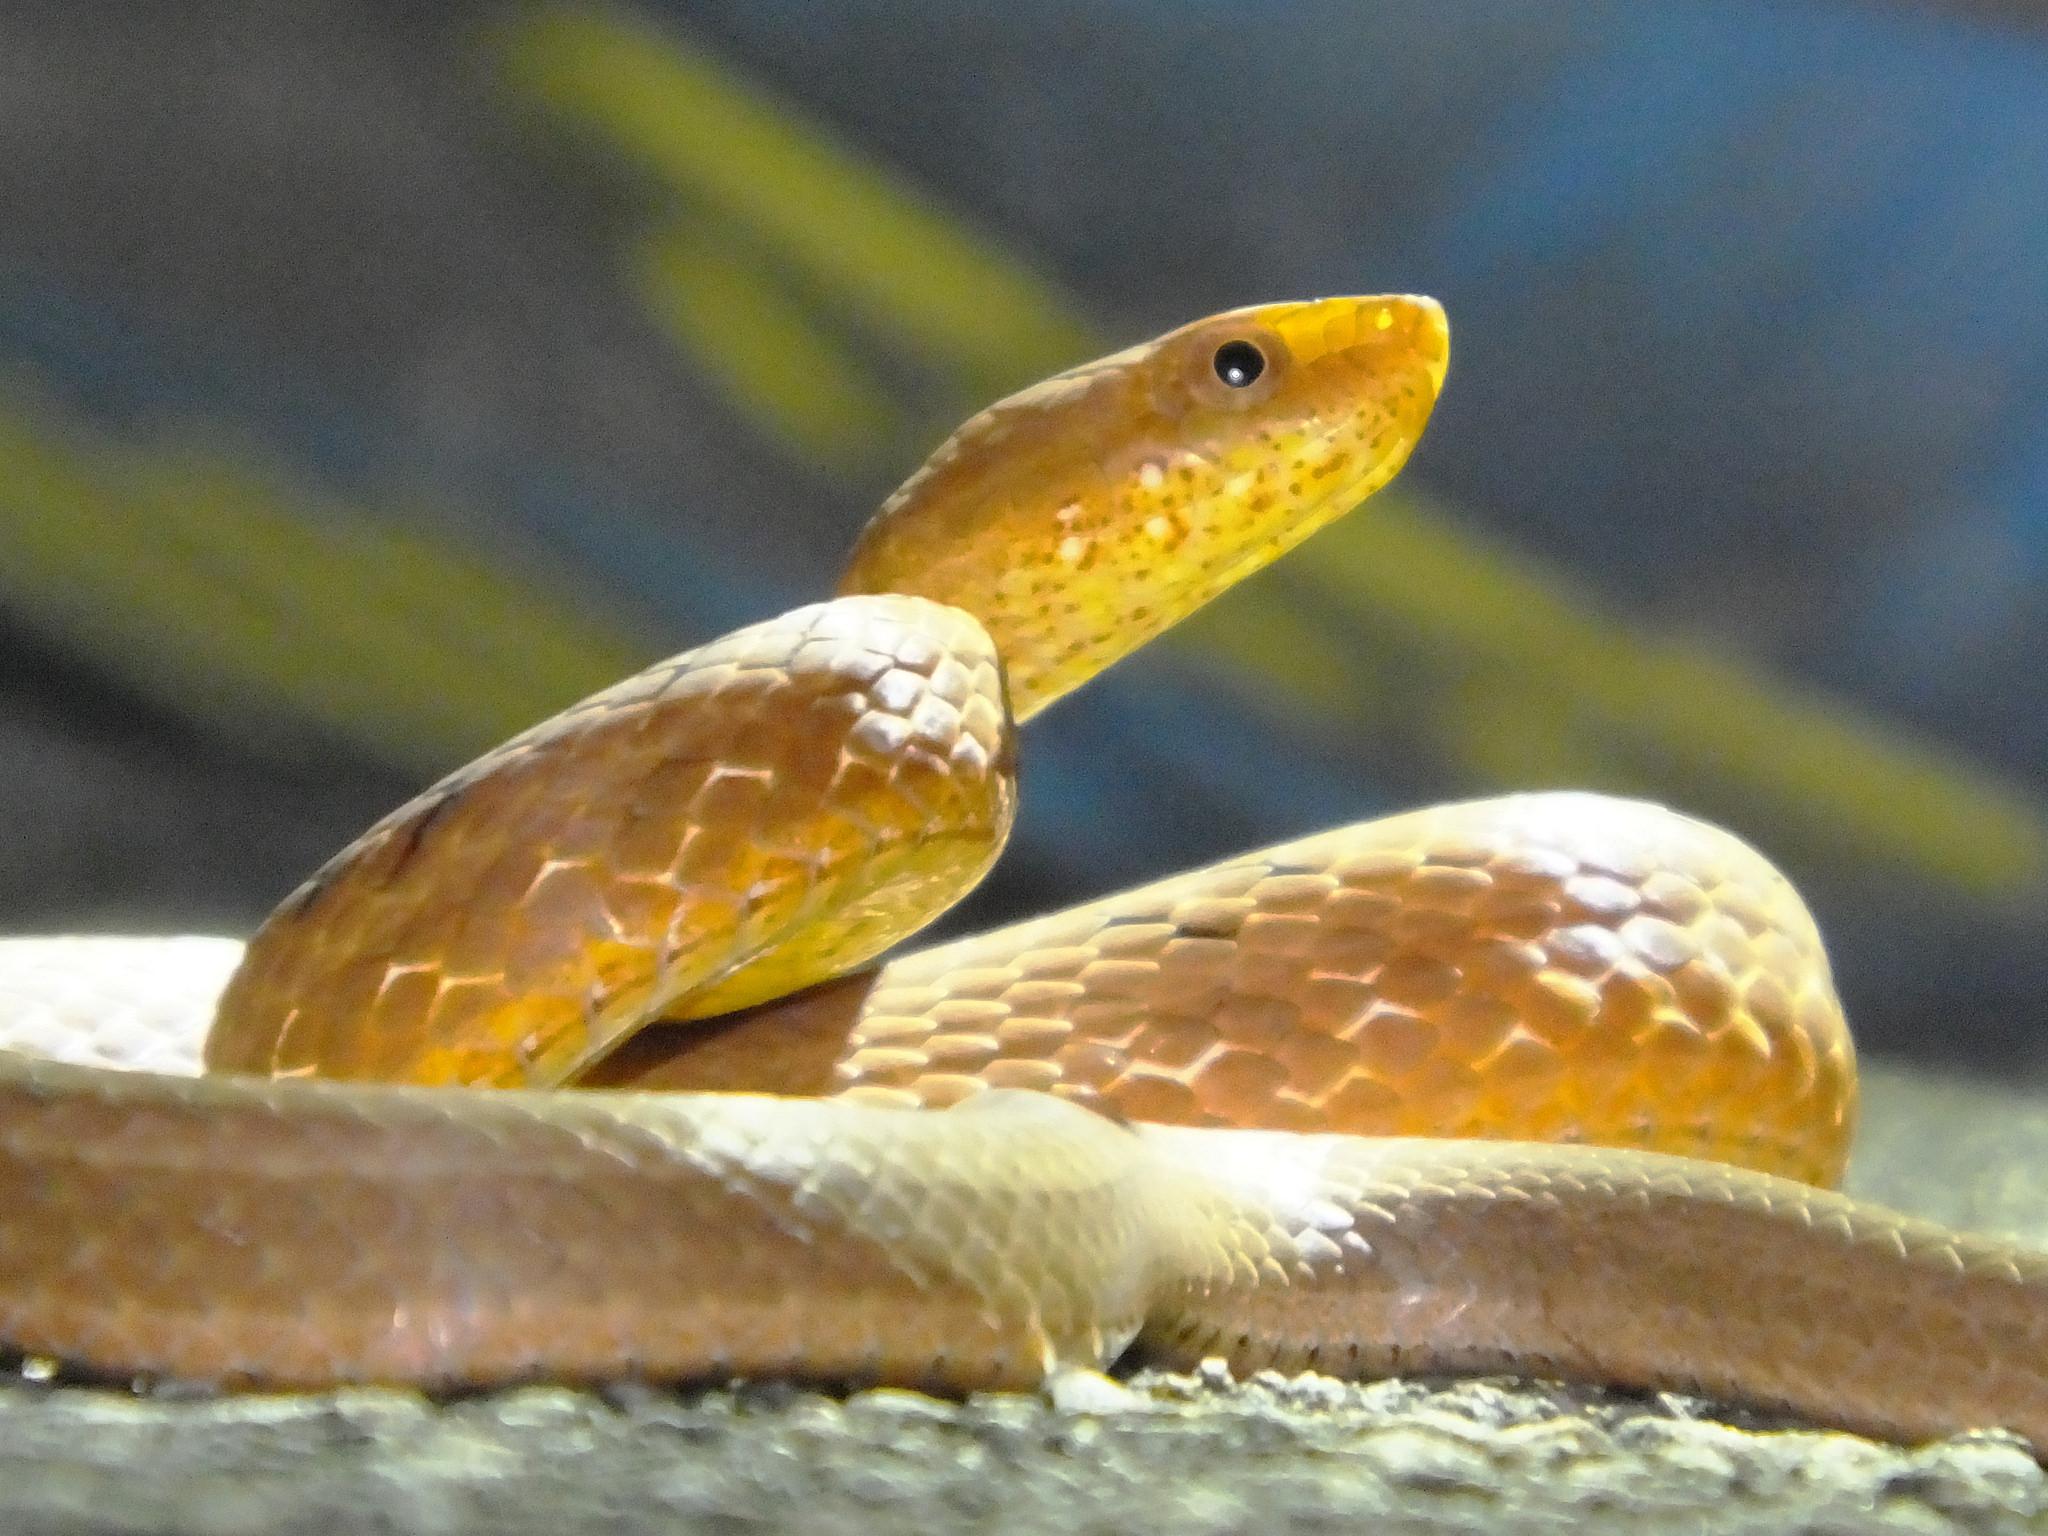 Rufous Burrowing Snake | © Charles Lam/Flickr